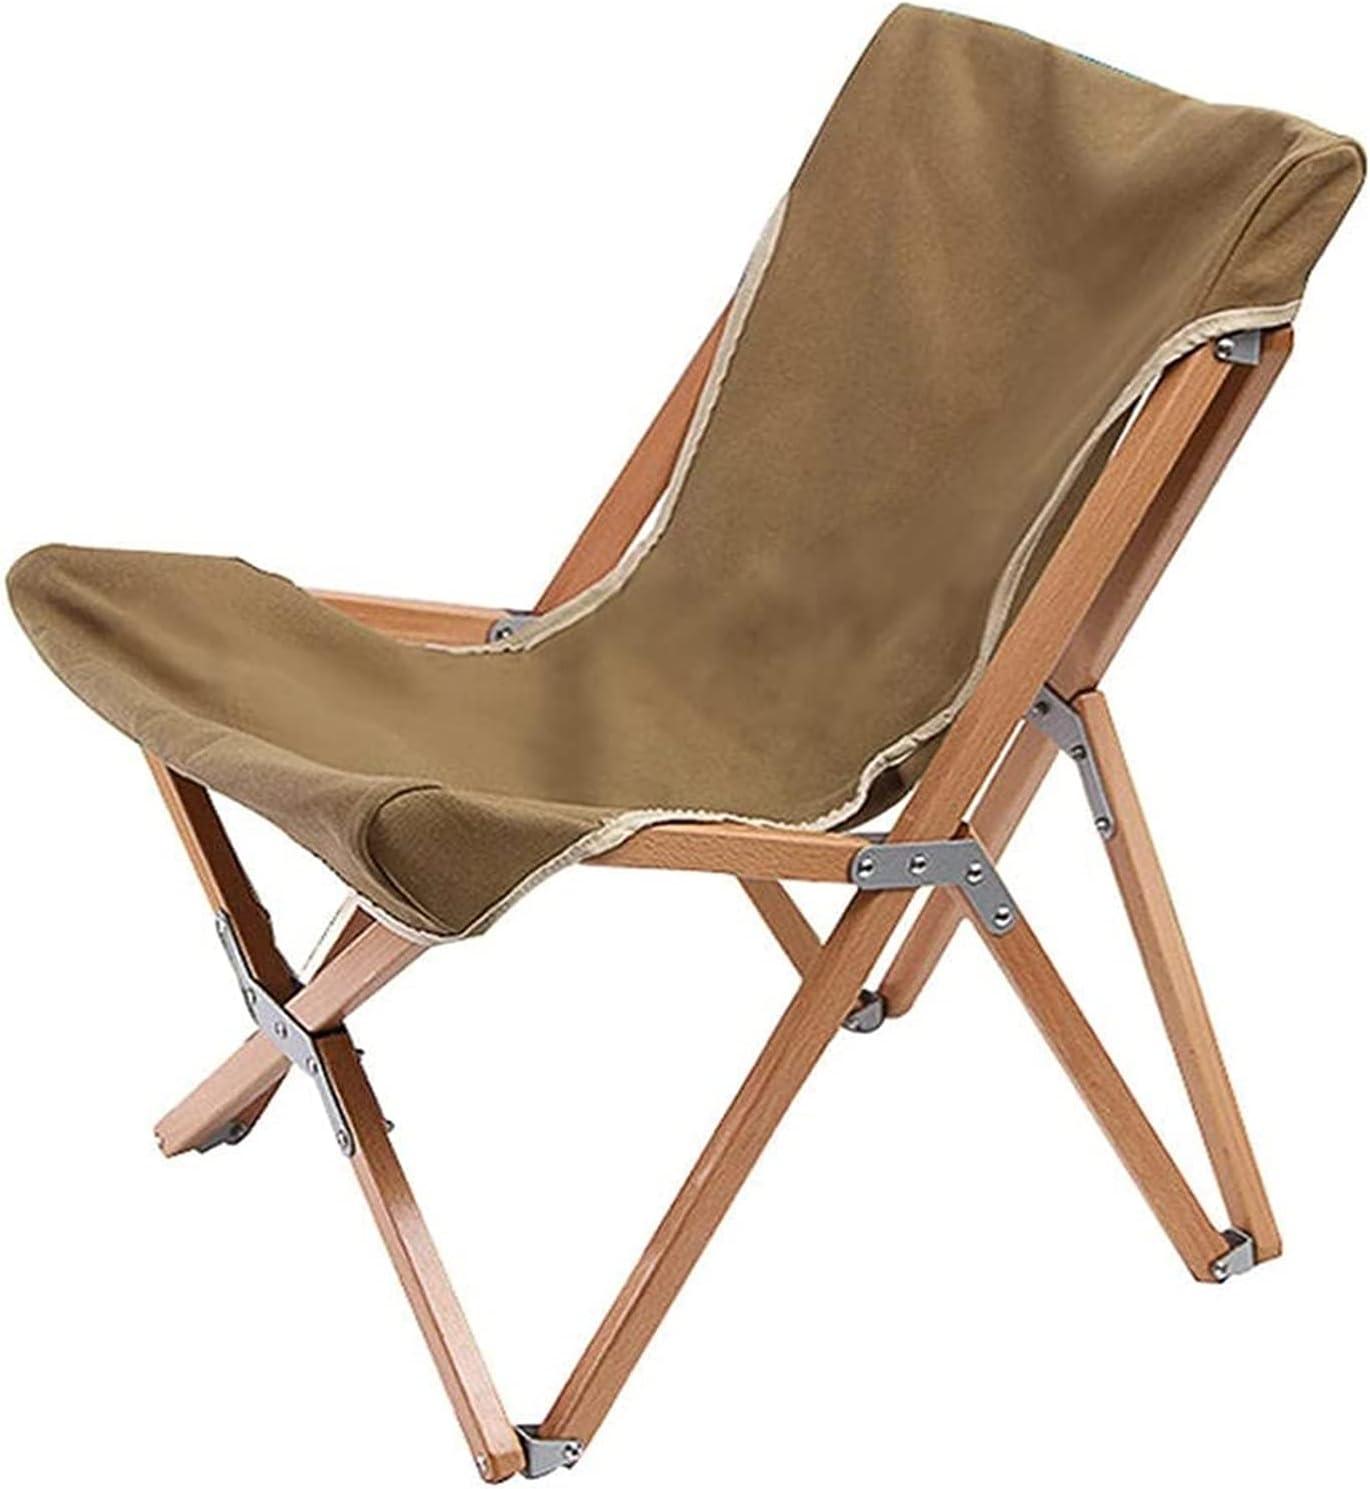 ZHJ New Orleans Mall Picnic Max 55% OFF Chair Folding Porta Canvas Garden Beech